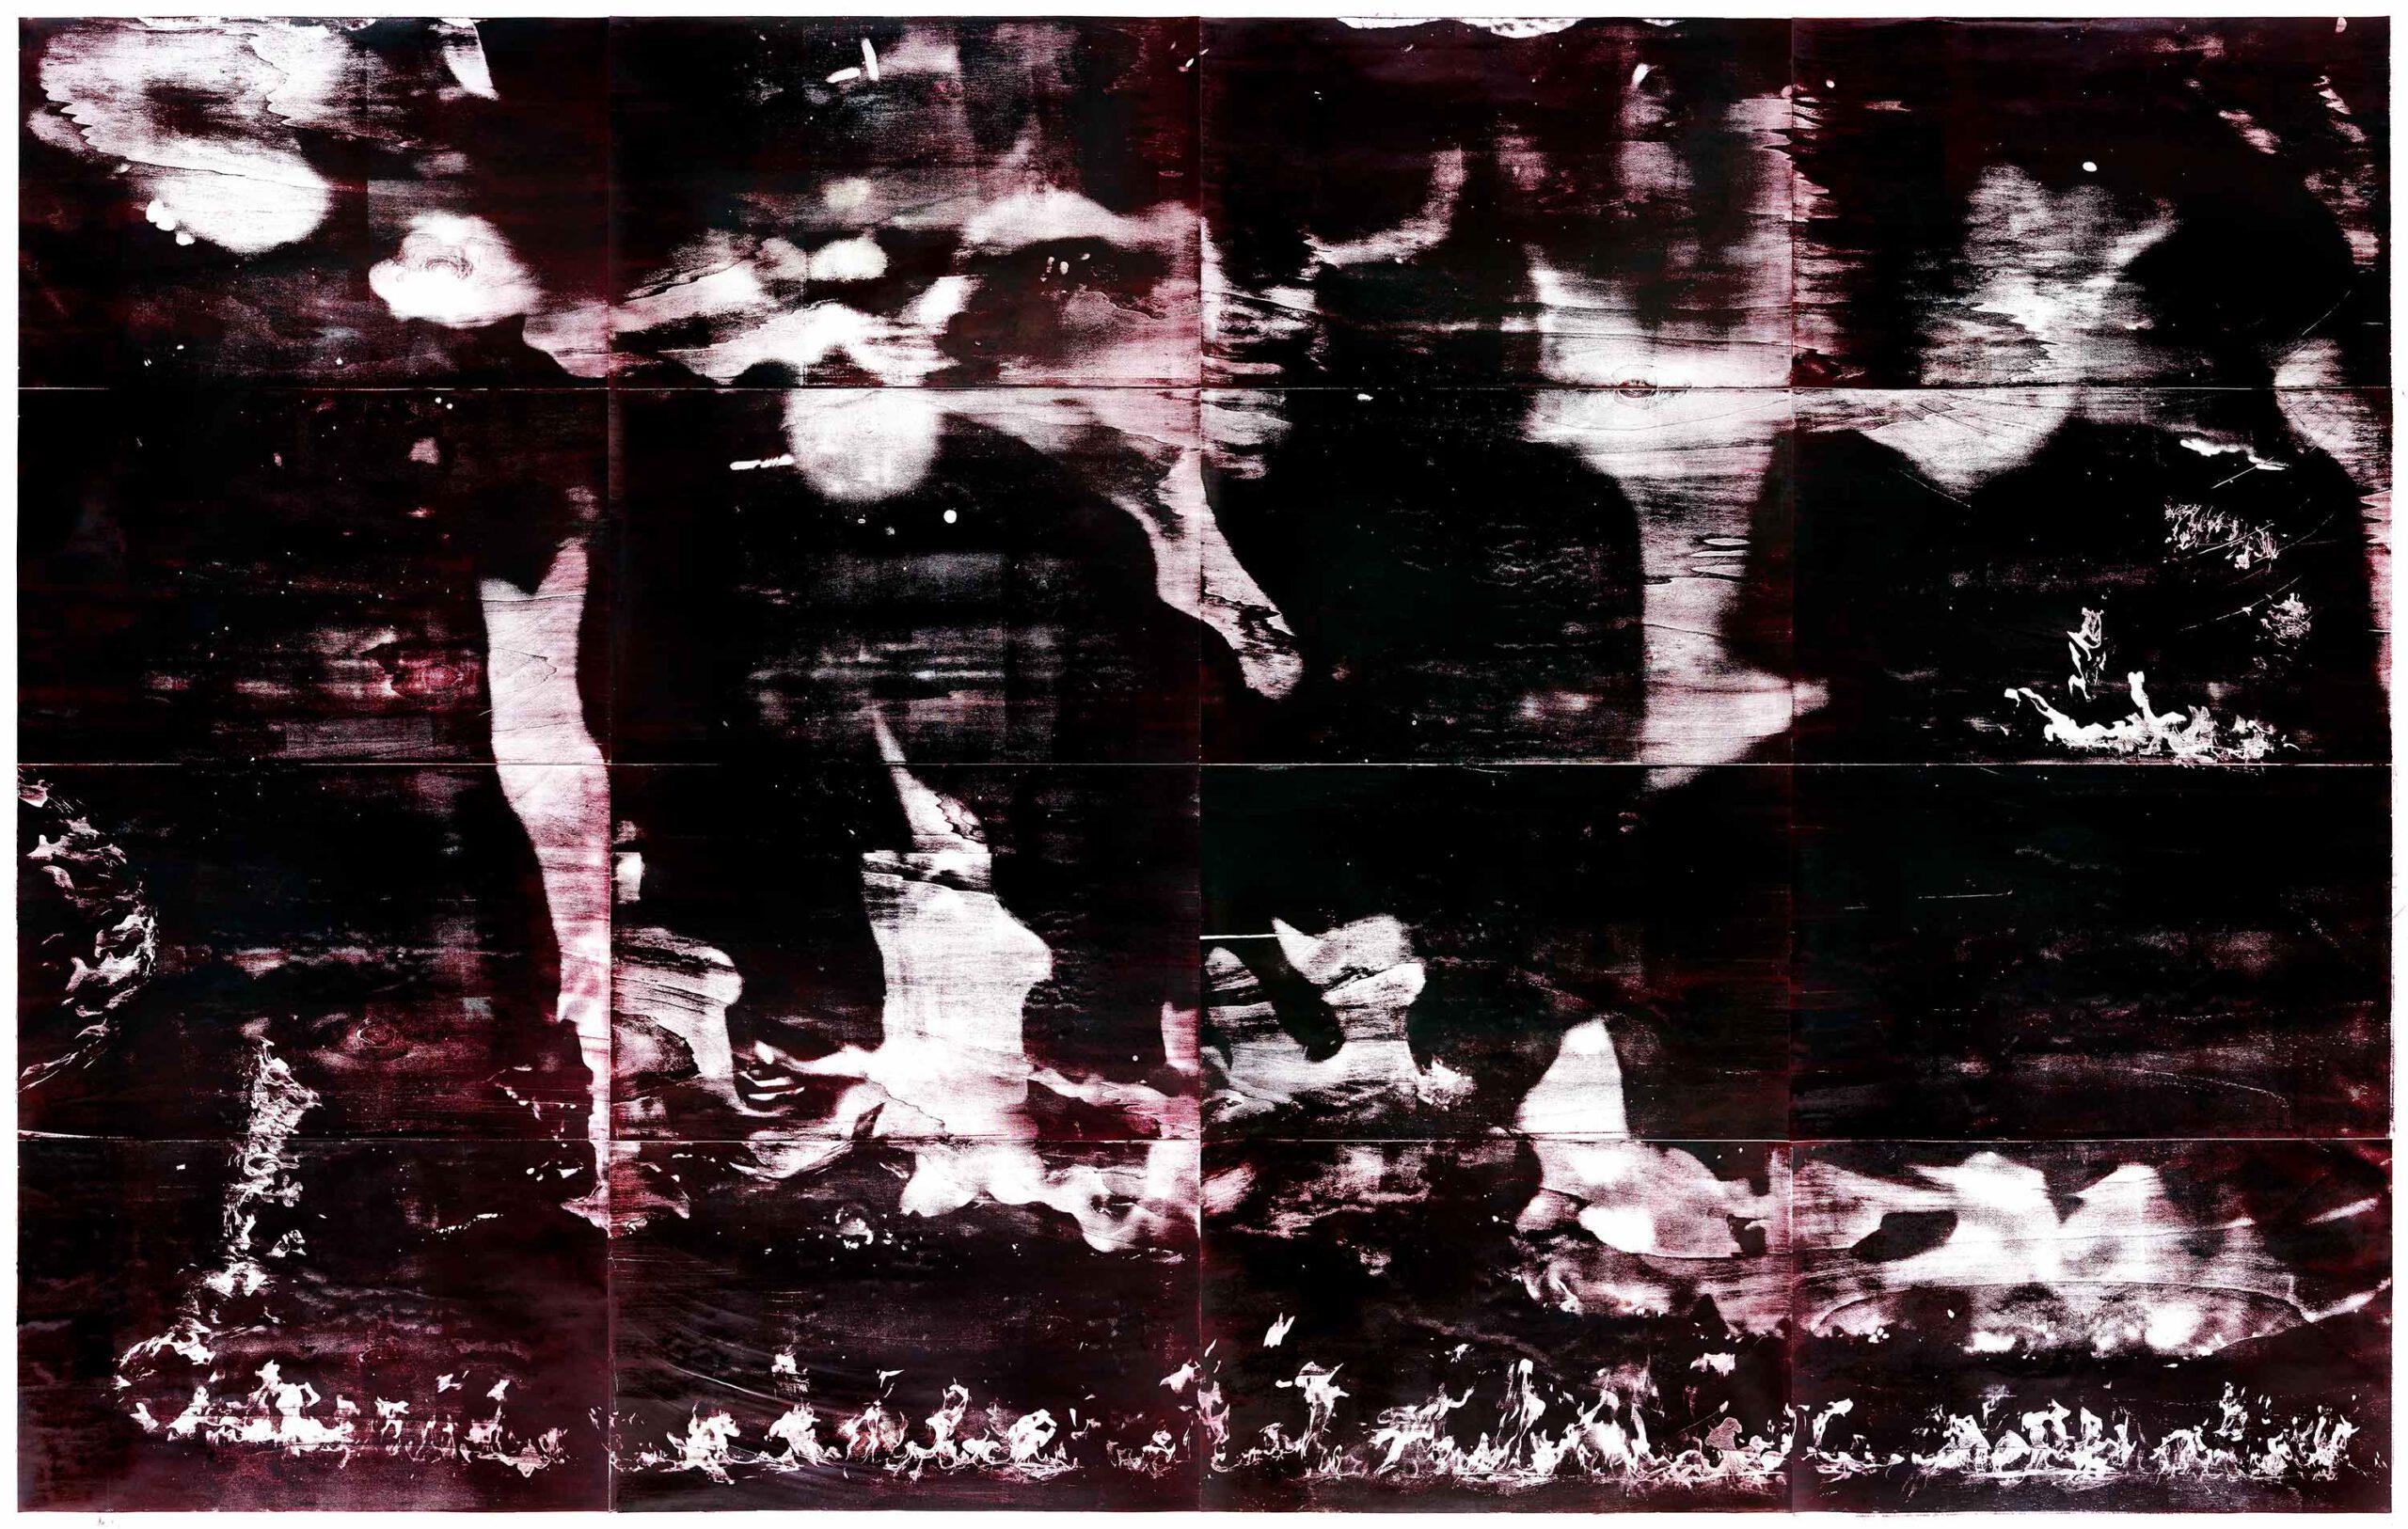 Flammen (r), 2020, wood engraving, 254 x 396 cm